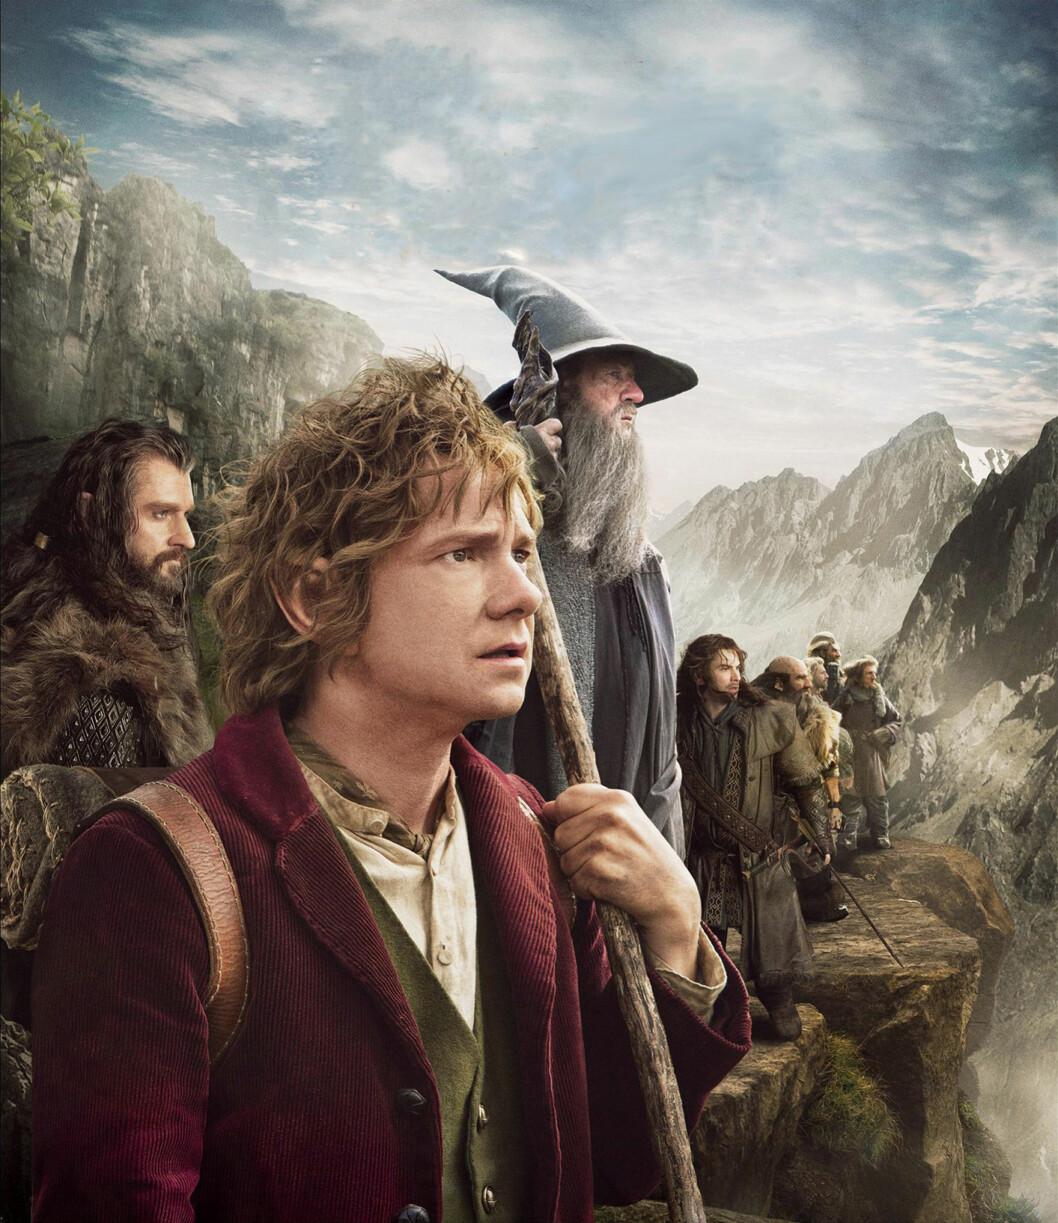 The Hobbit: An Unexpected Journey (2012): tjente 1,02 milliarder dollar.  Foto: METRO GOLDWYN MAYER / Album